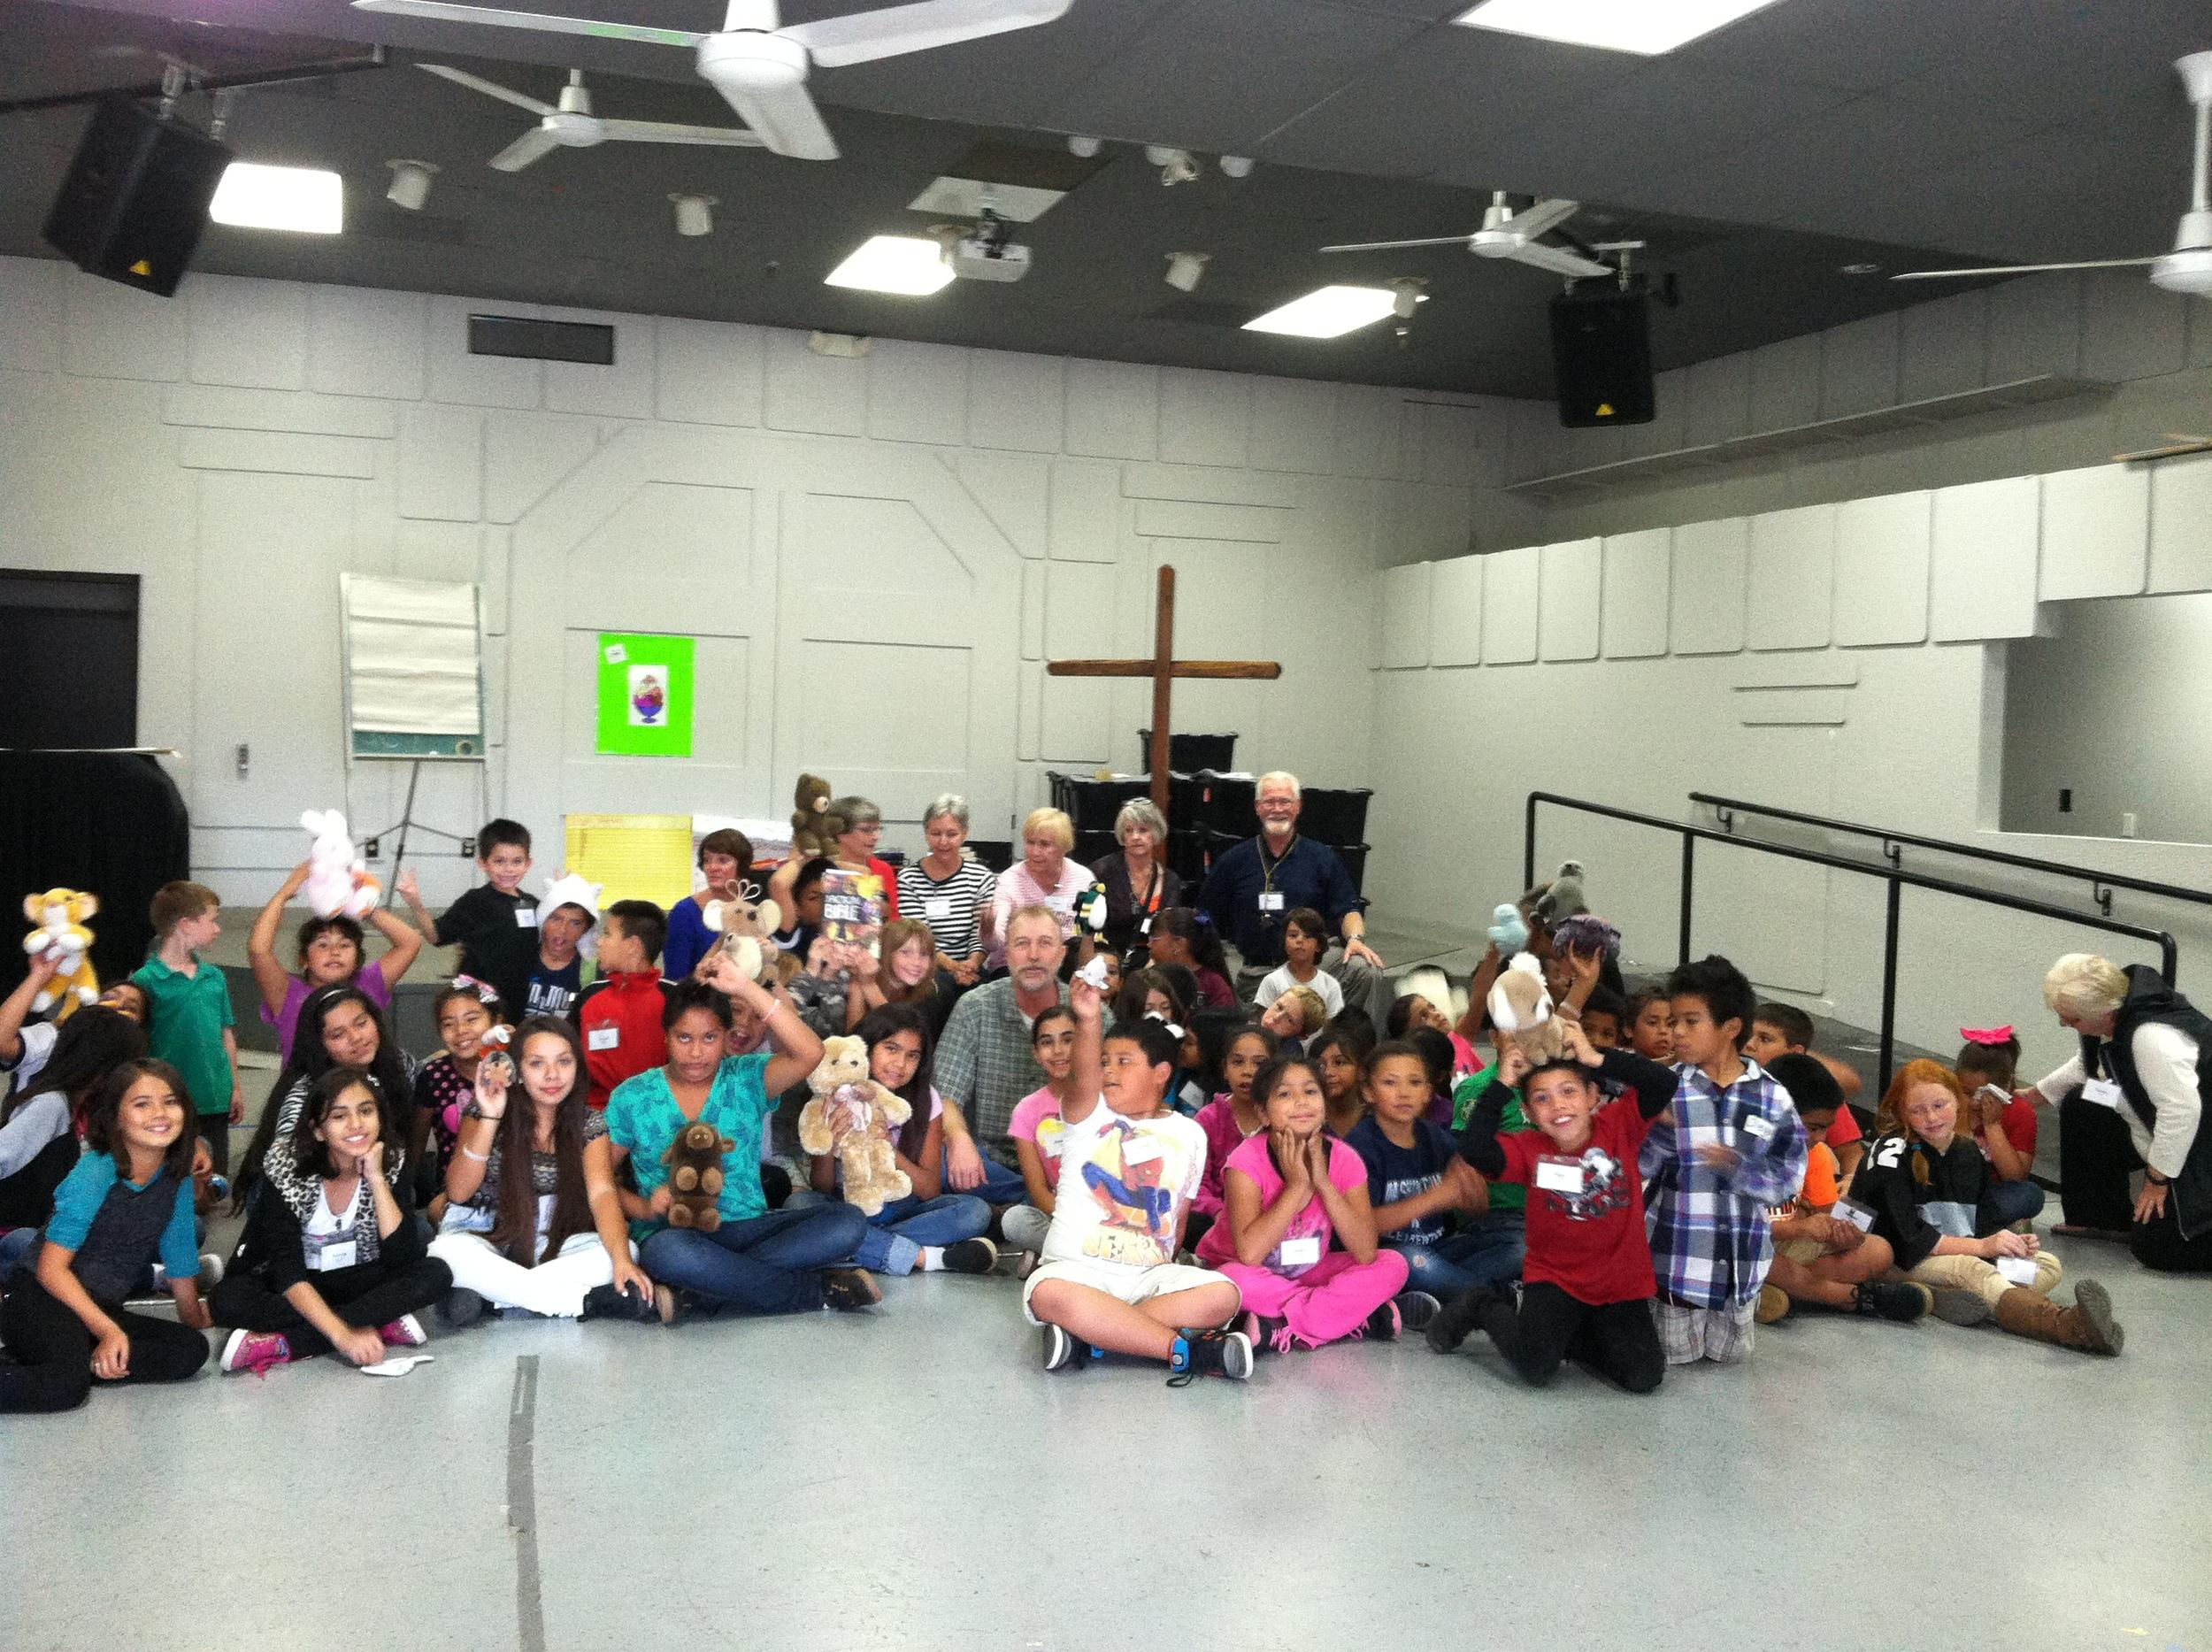 Treasures of Heaven Bible Club - Group Photo - October 2014